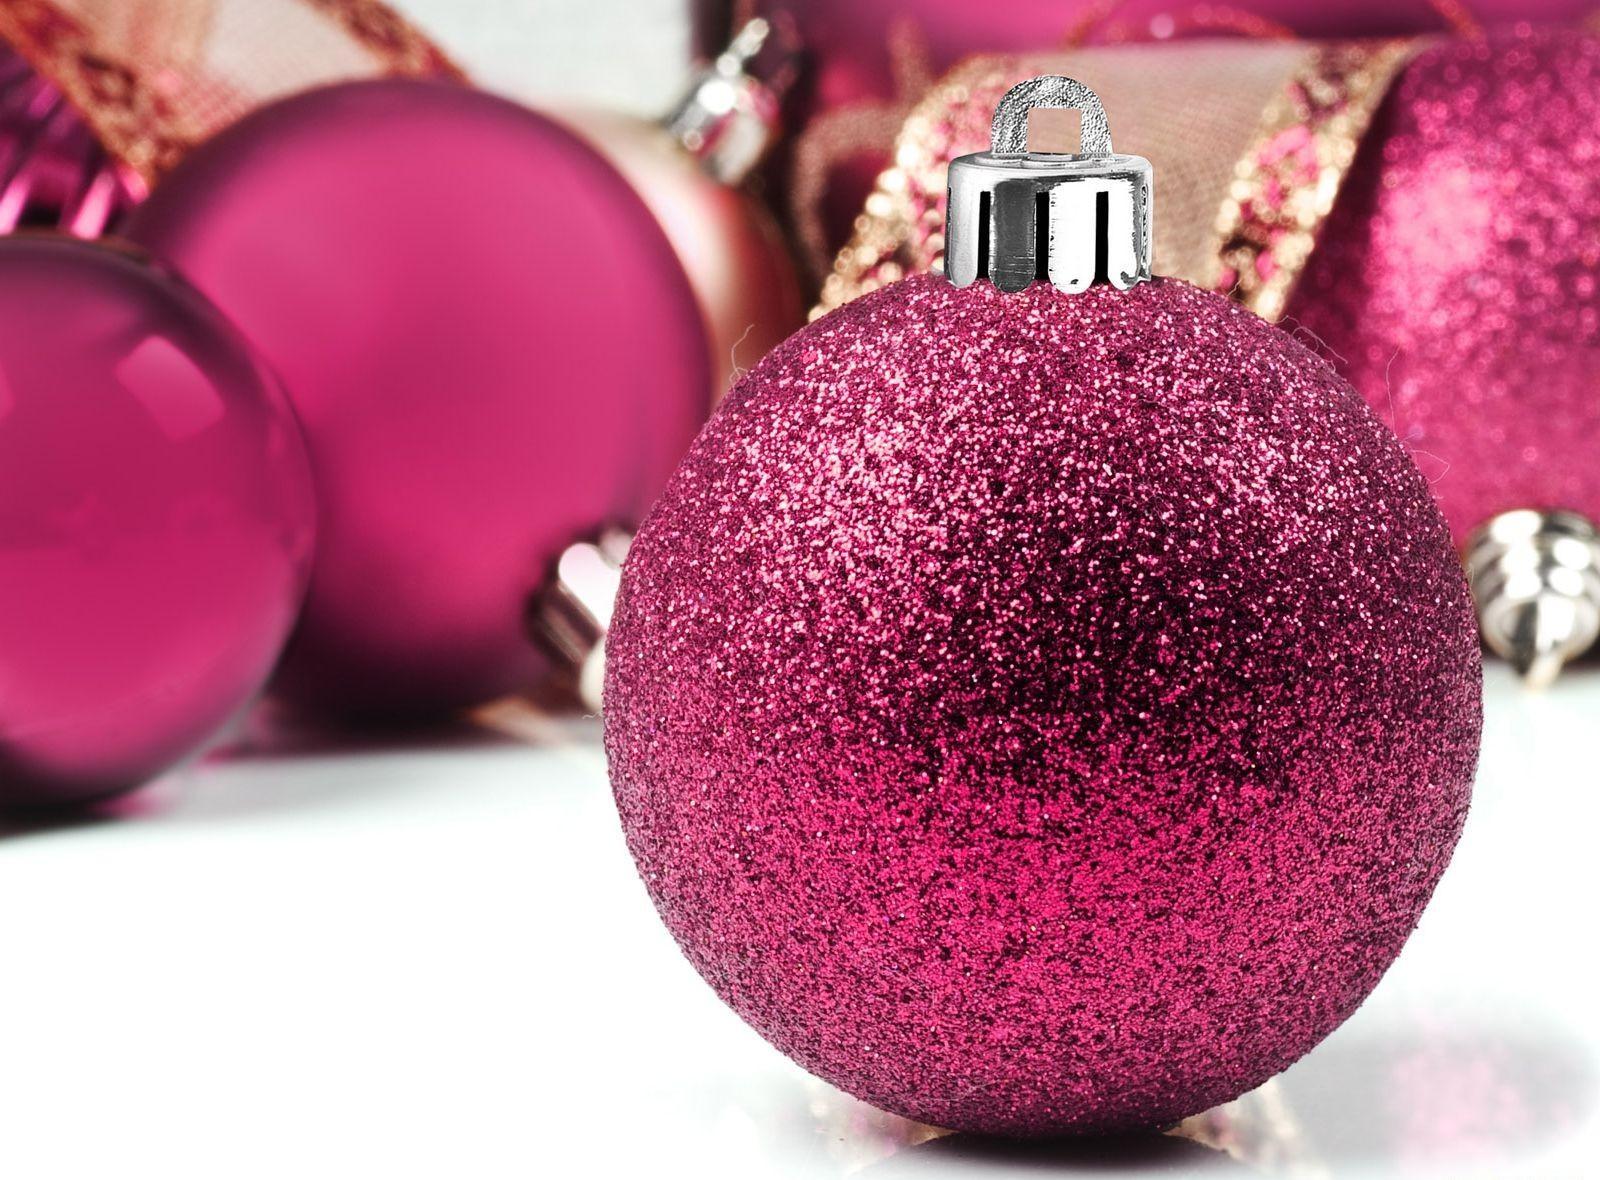 Popular Wallpaper Mac Christmas - christmas-decorations-purple-color-balloons-glitter-wallpaper  Image_543897.jpg